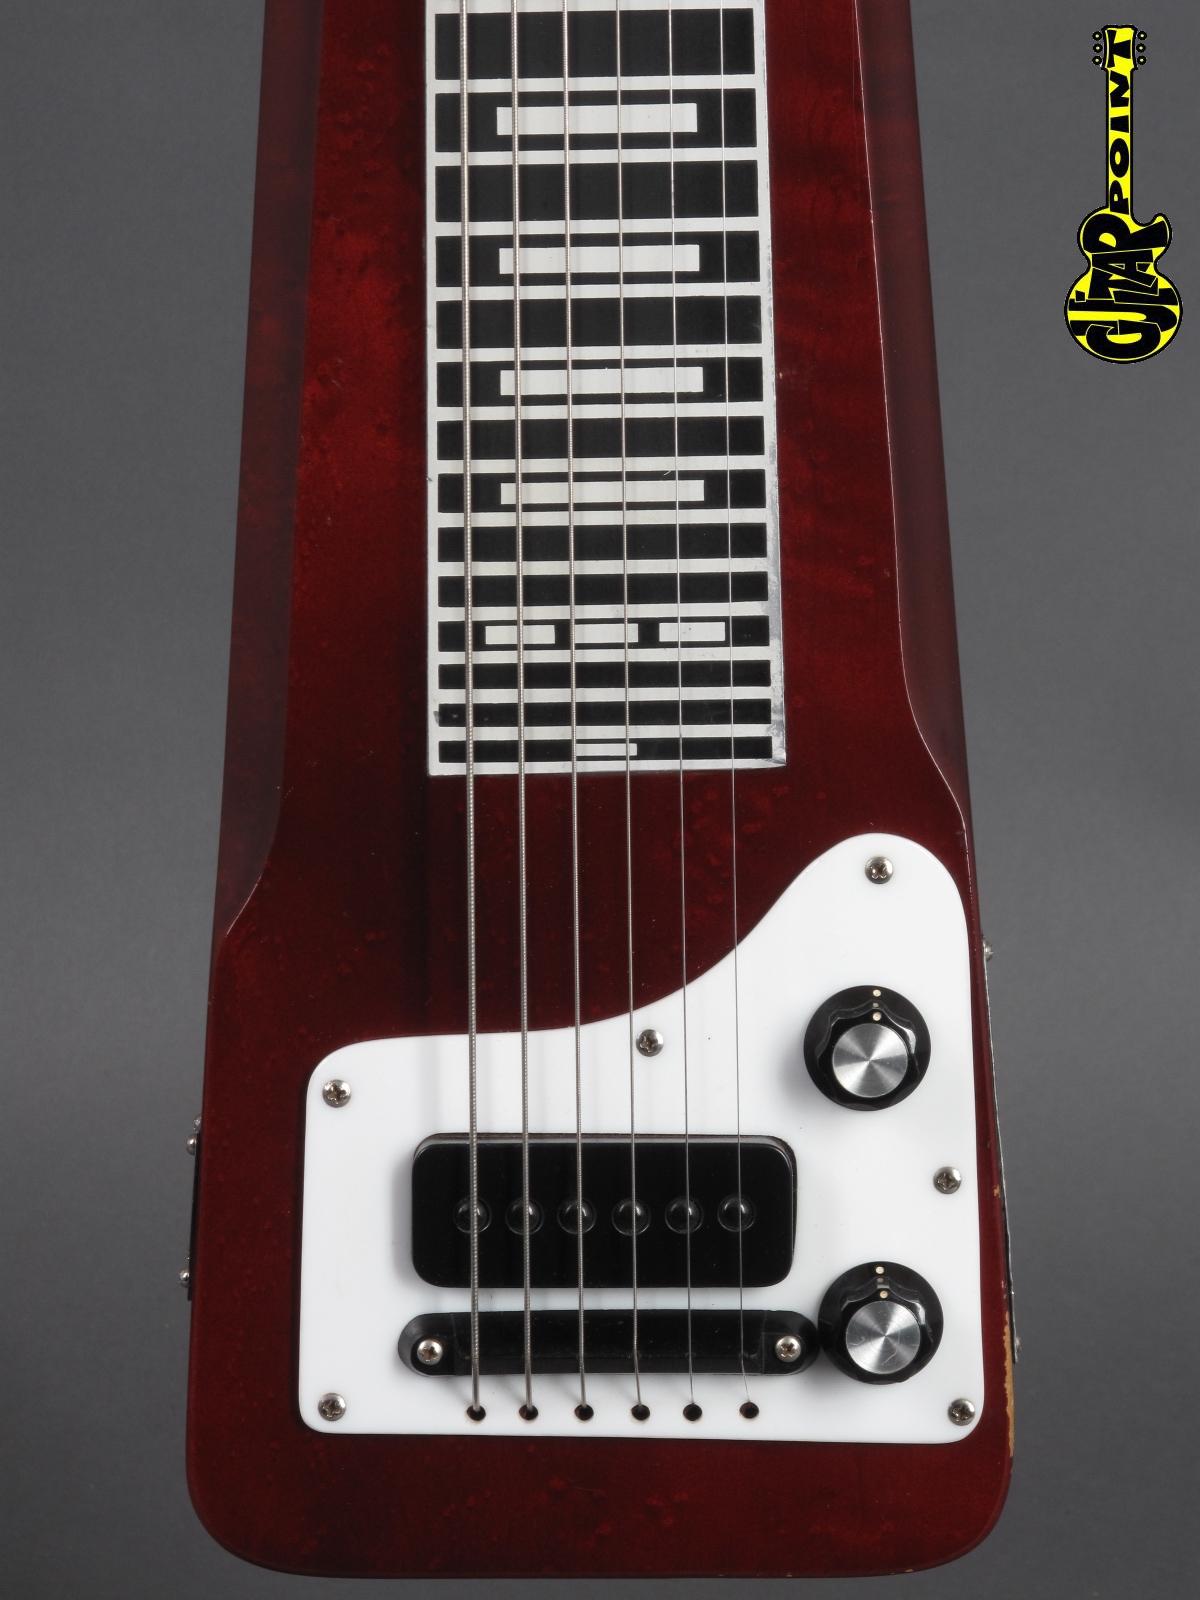 1975 Rickenbacker Electro Lapsteel - Cherry